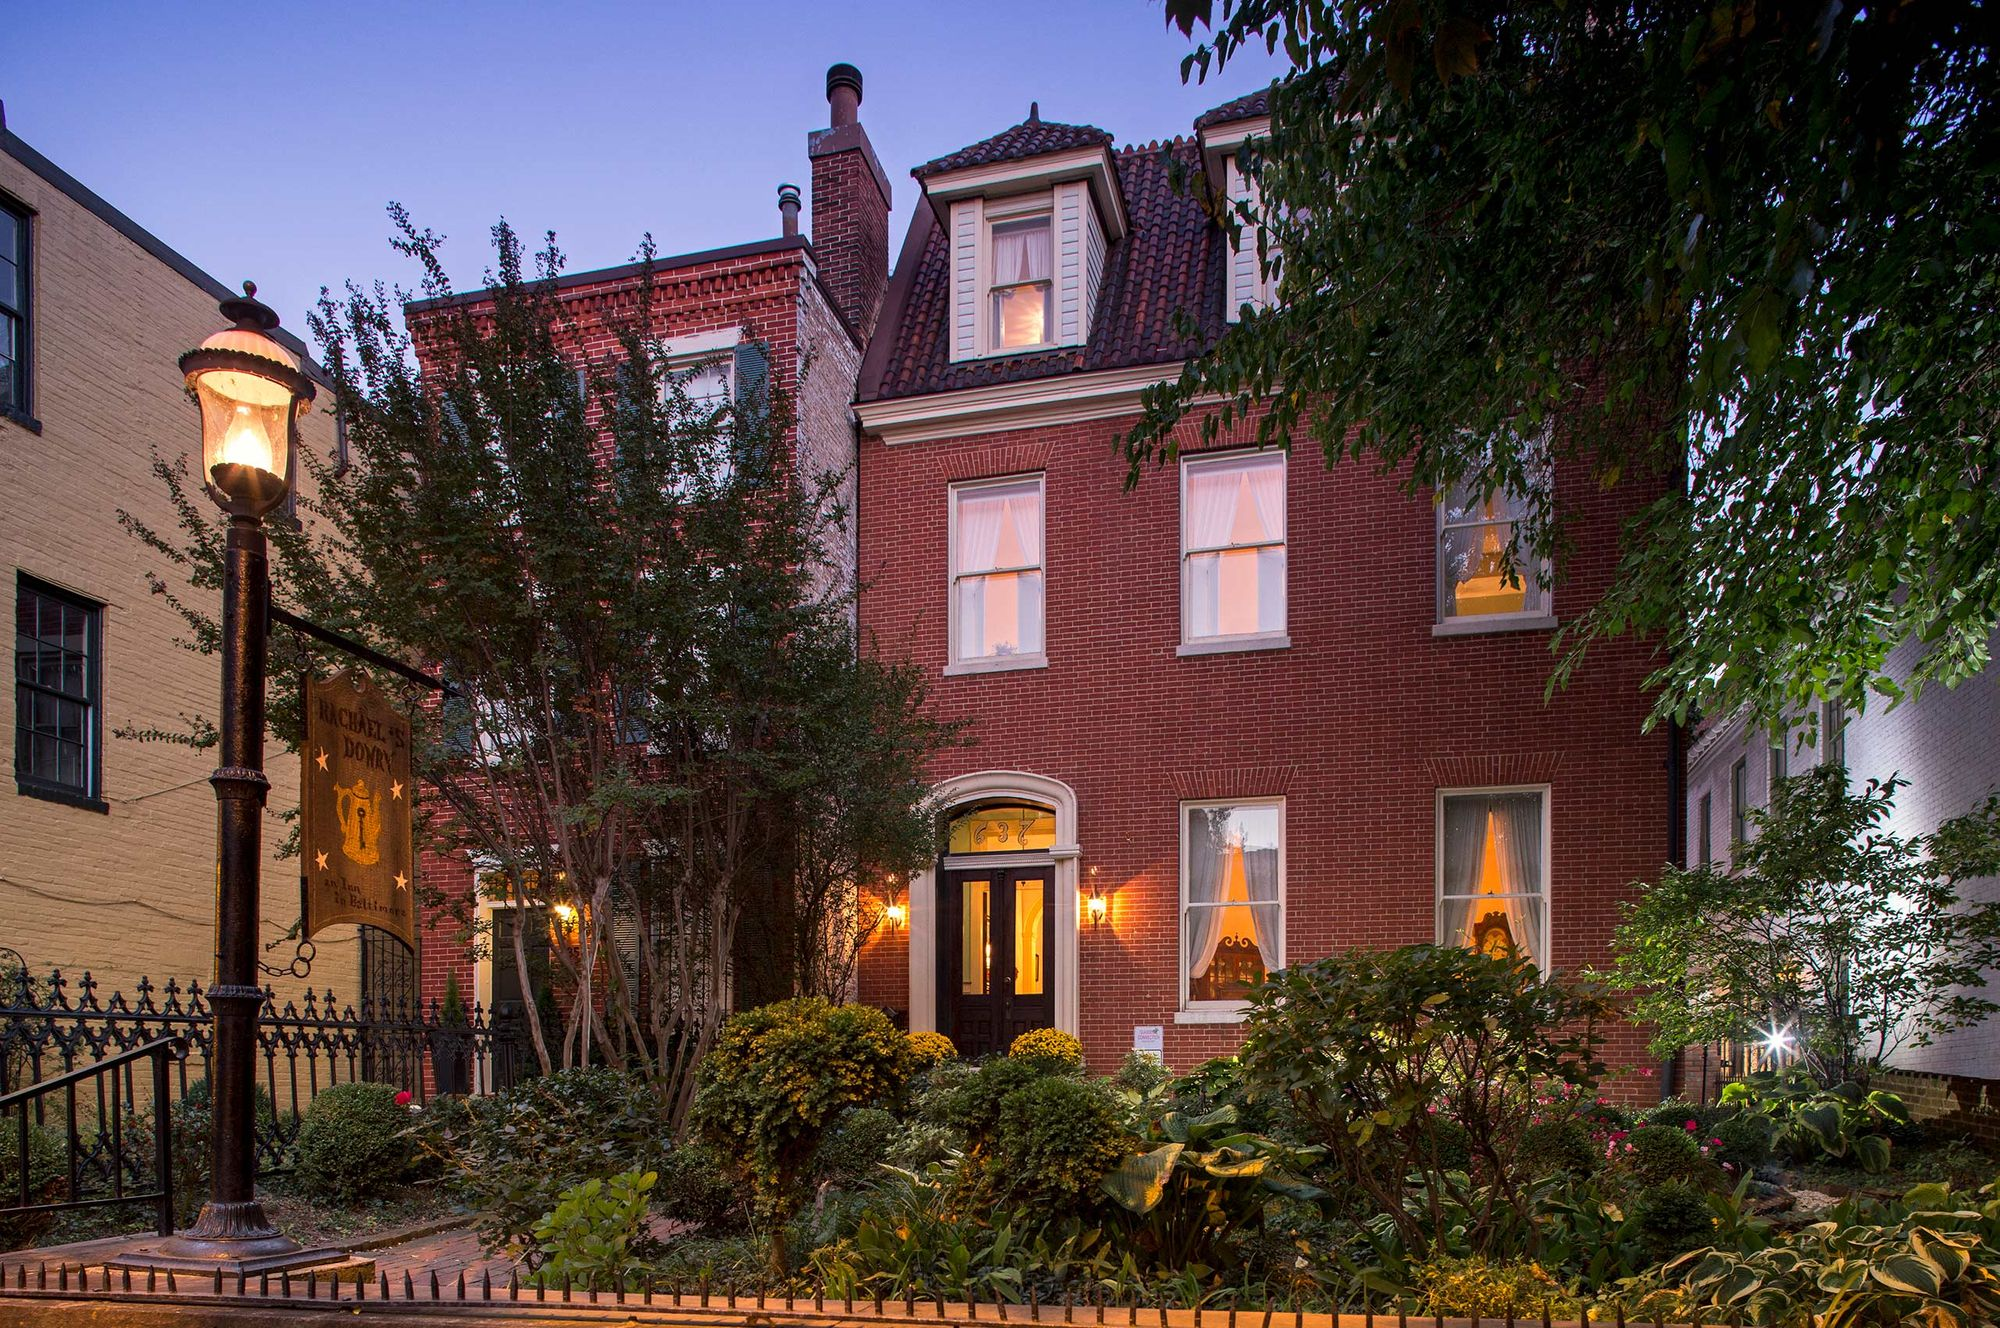 Baltimore-Maryland-Bed-&-Breakfast-Twilight-Exterior.jpg